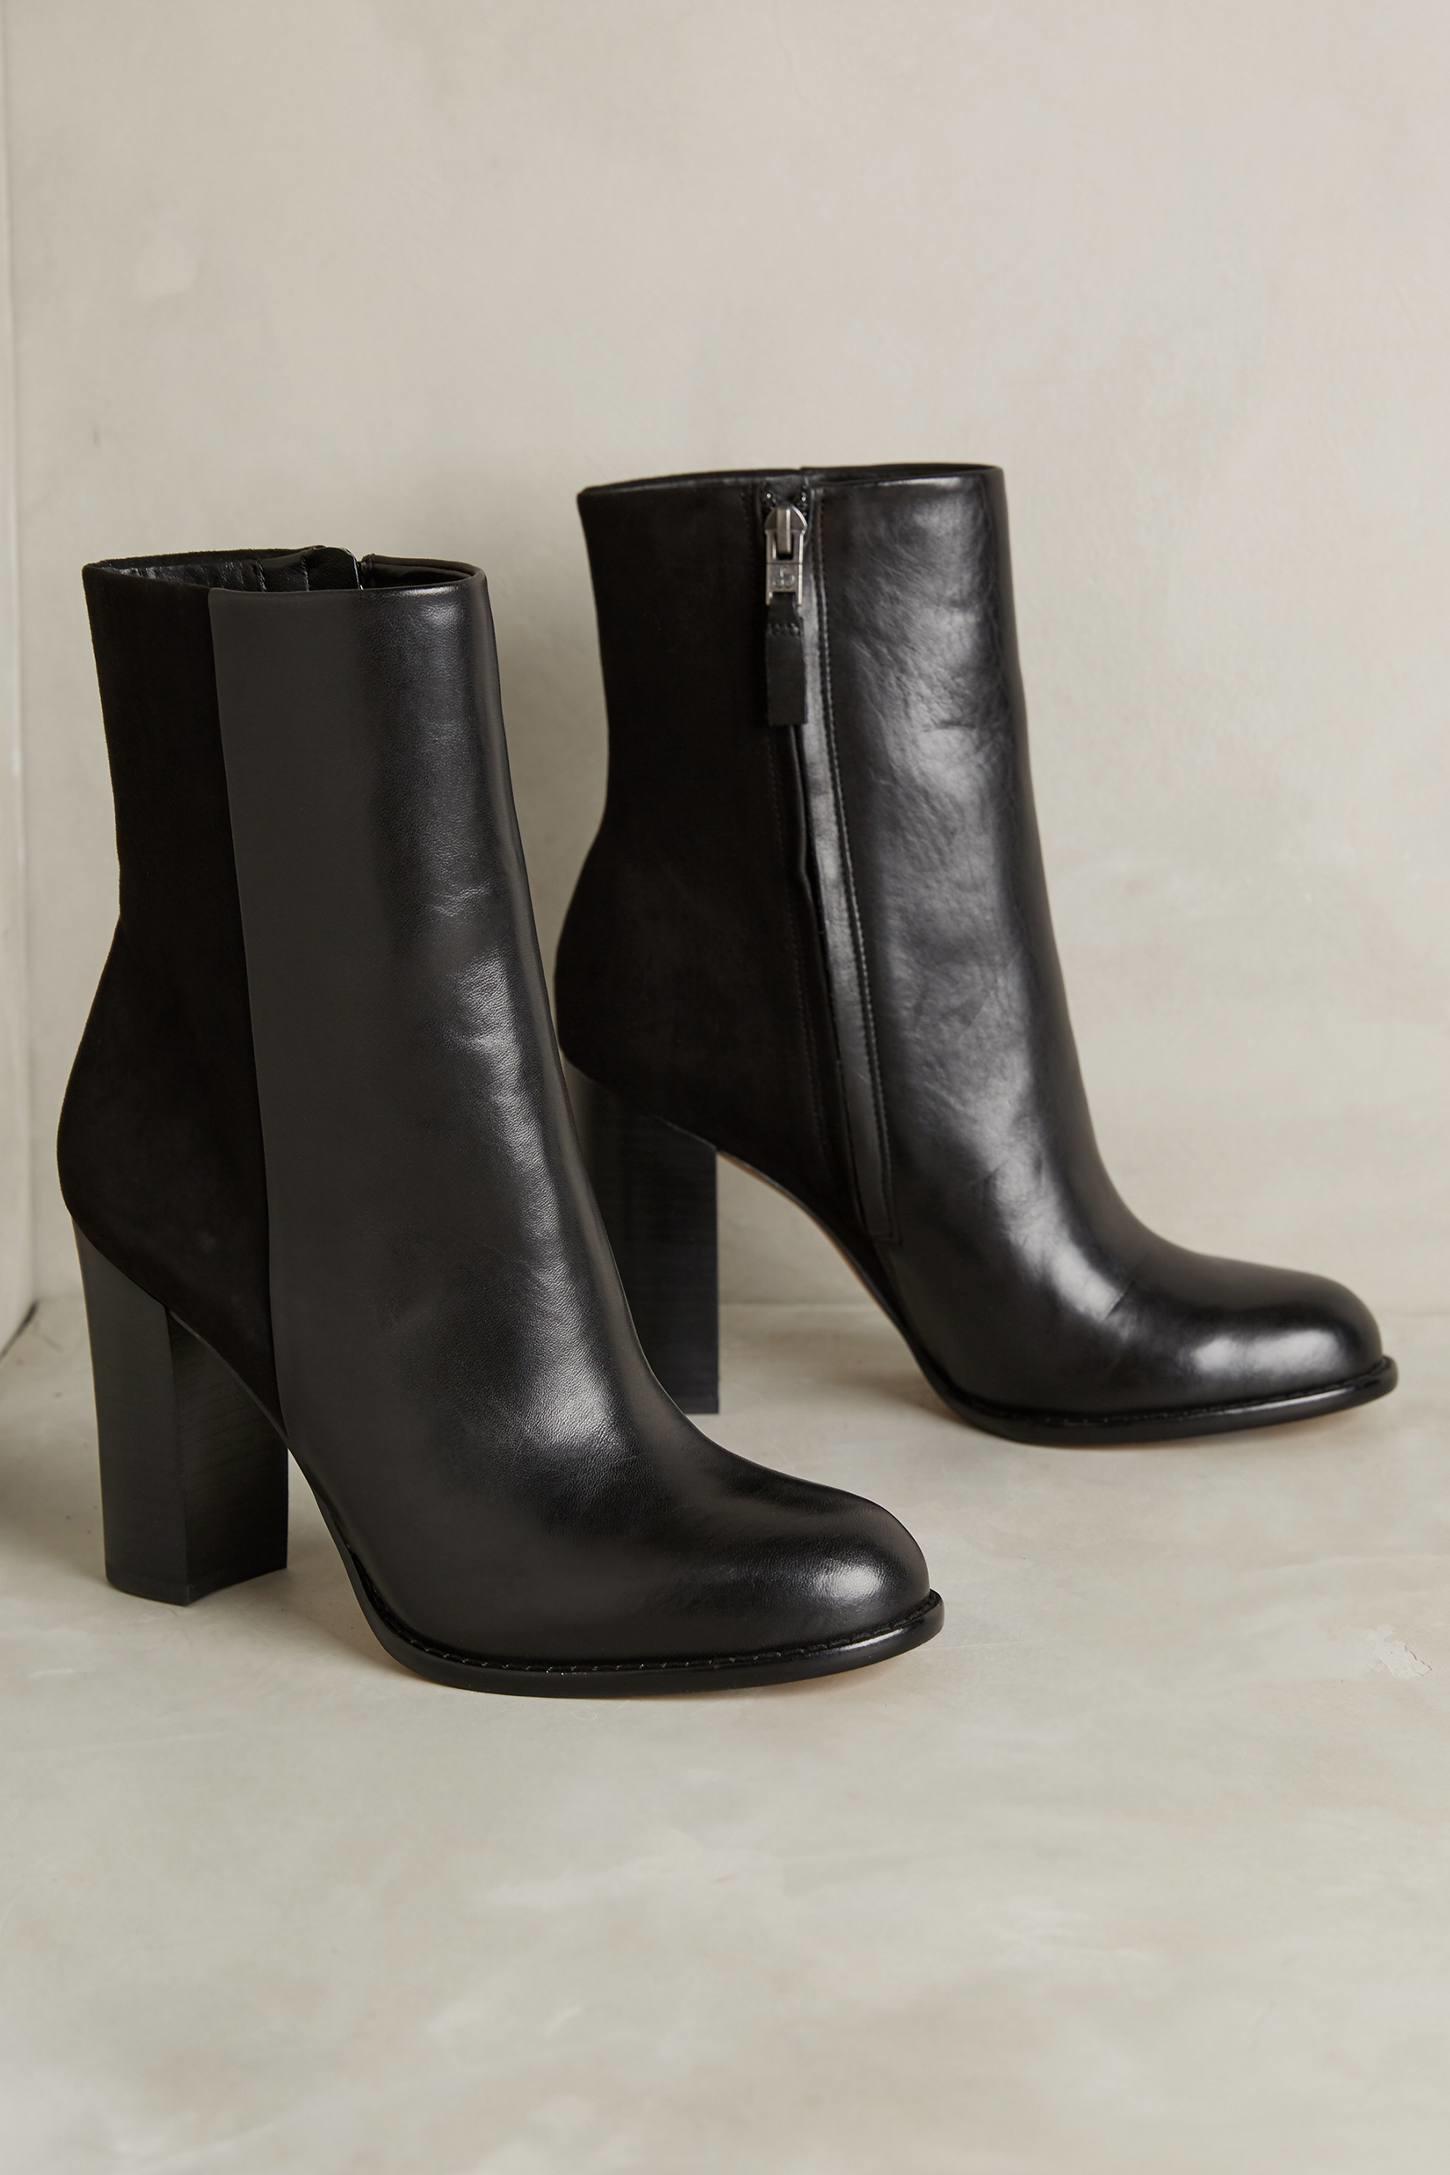 Lyst Sam Edelman Reyes Boots In Black